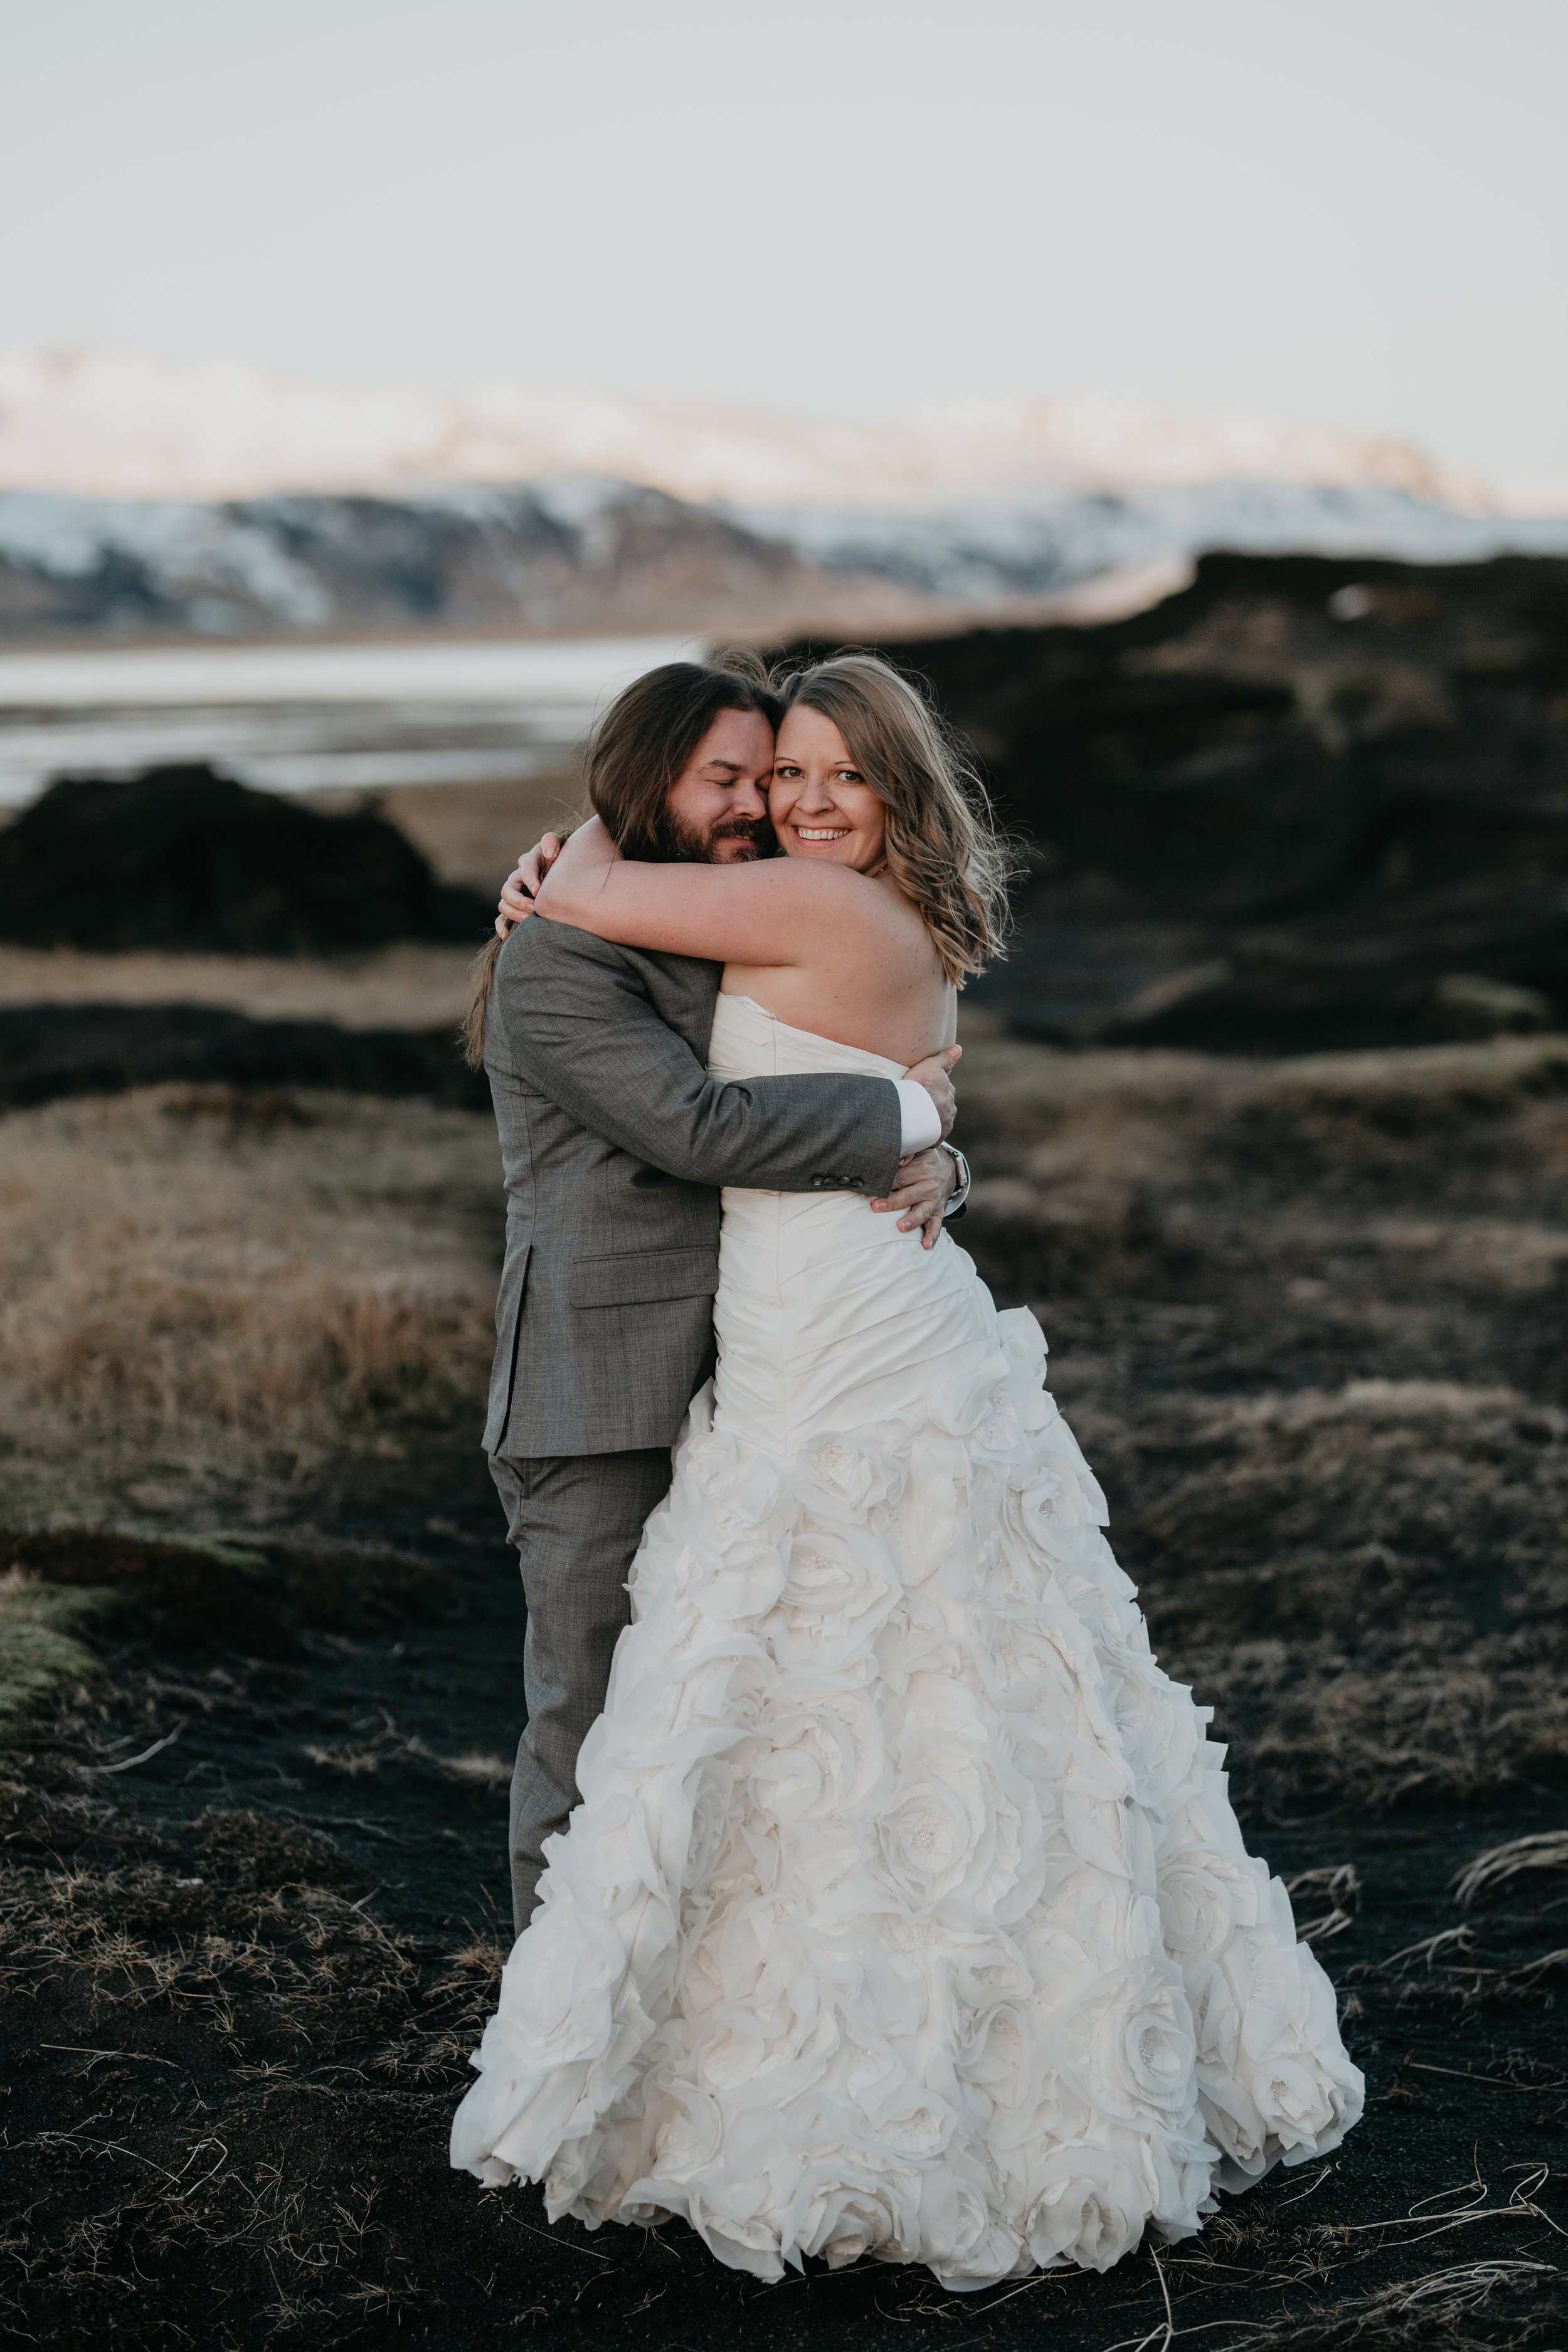 nicole-daacke-photography-iceland-winter-sunset-adventure-elopement-skogafoss-waterfall-black-sand-beach-dyrholaey-vik-iceland-intimate-wedding-black-church-elopement-photographer-29.jpg